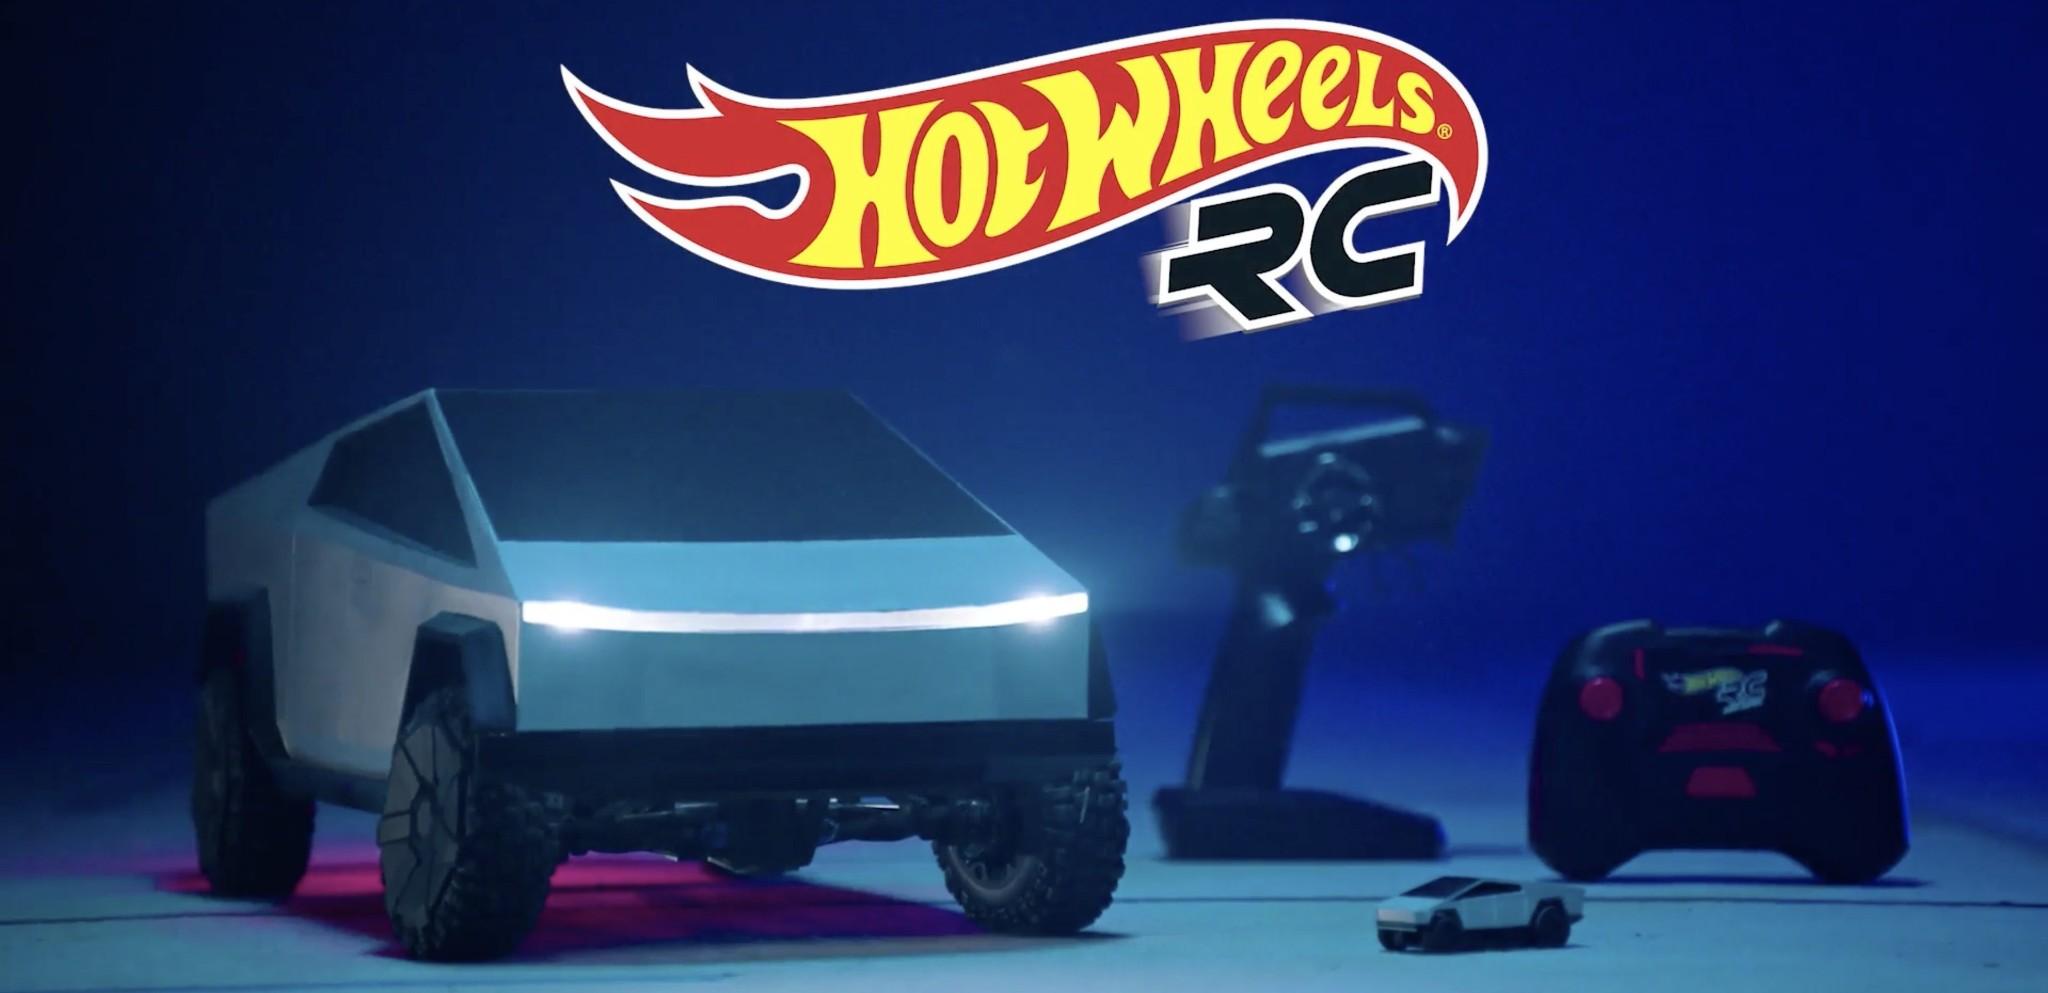 Tesla partners with Hot Wheels on Cybertruck remote-controlled toys, pre-orders open - Electrek